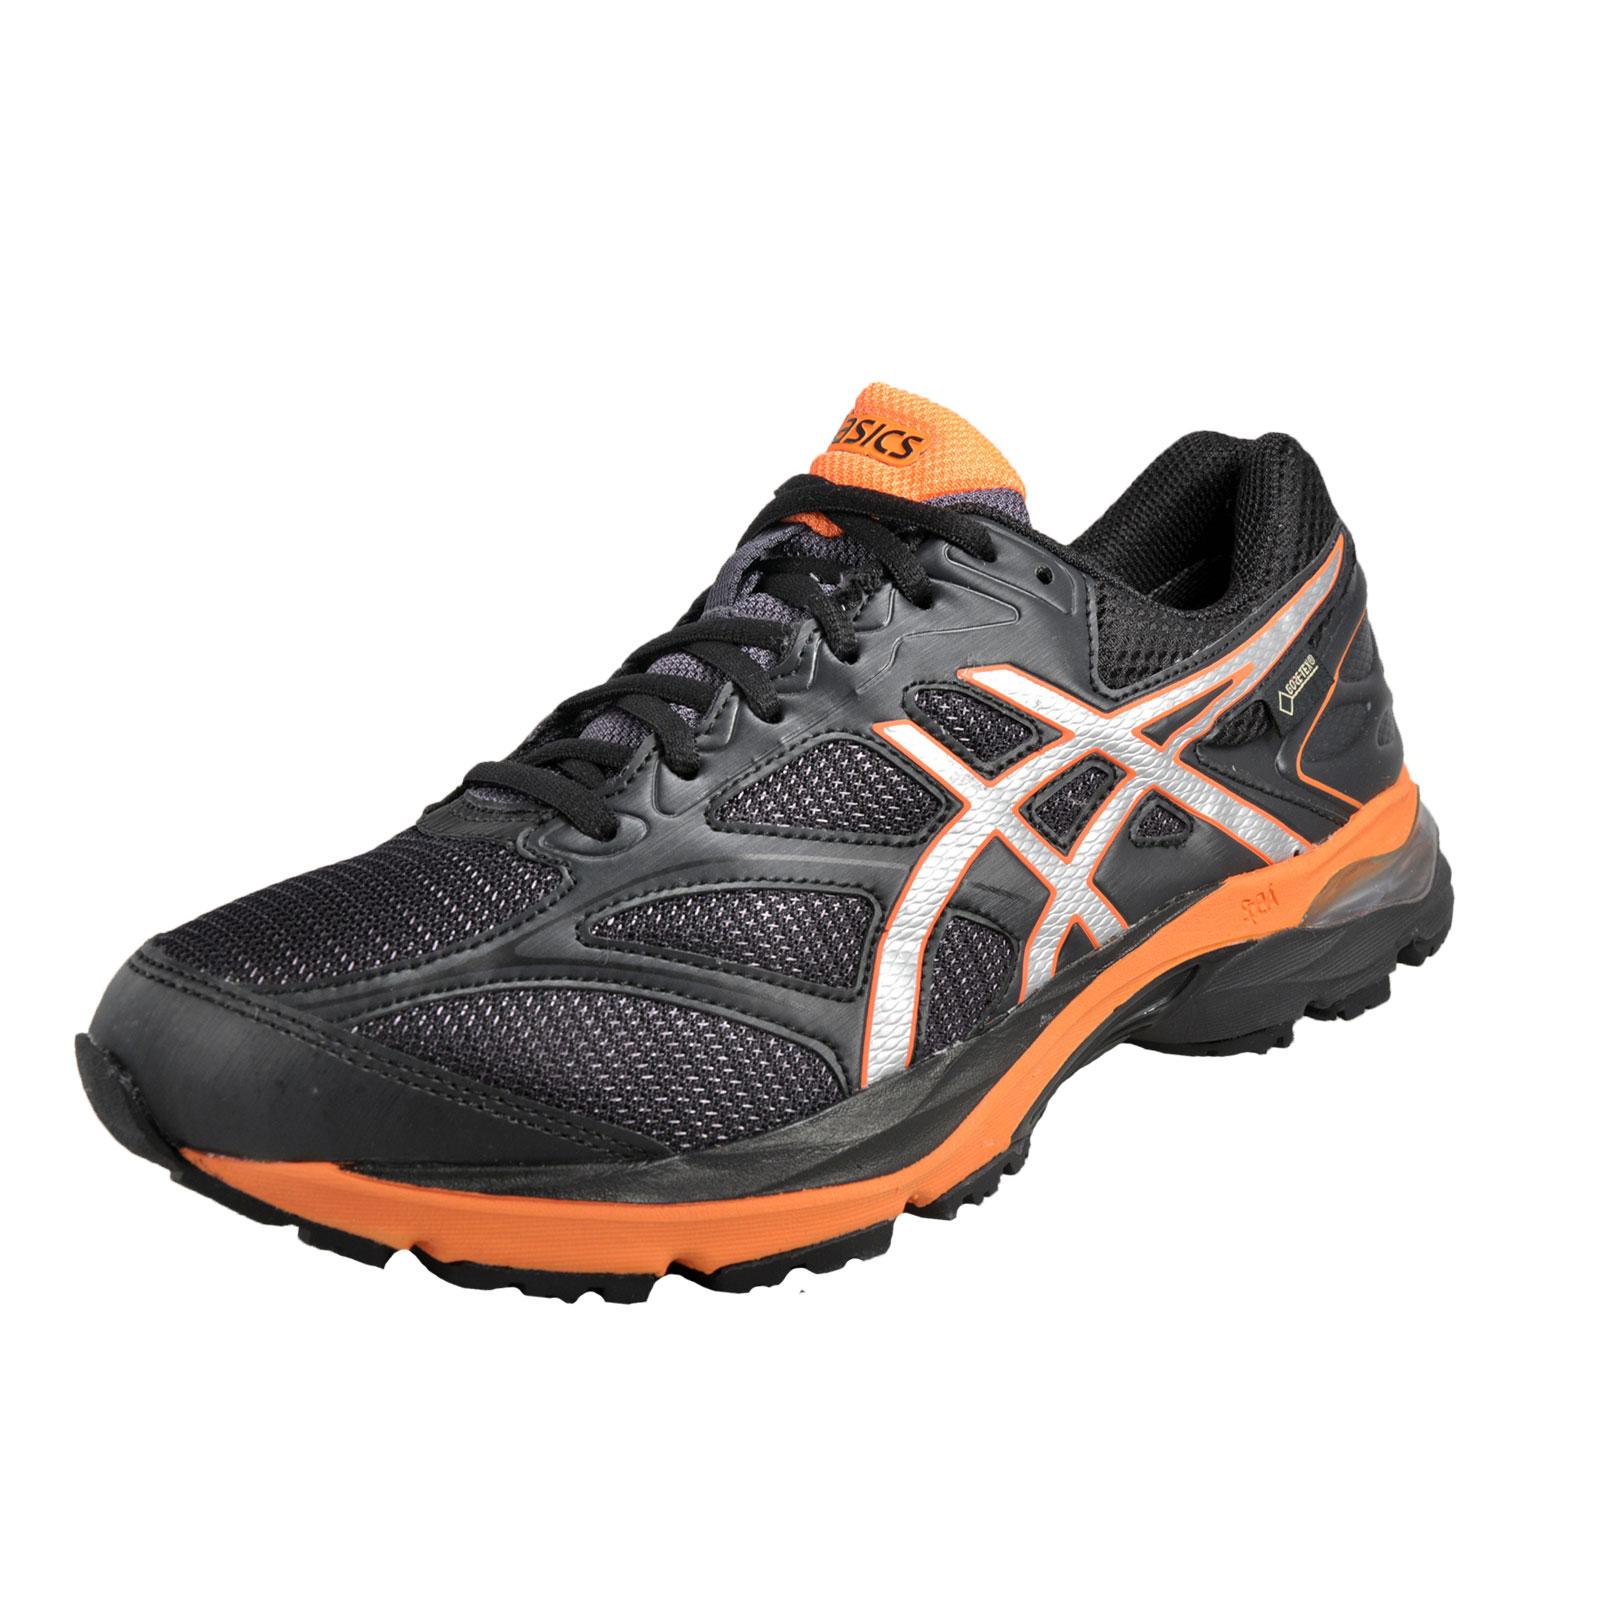 asics gel pulse 8 gtx gore tex mens running shoes black orange ebay. Black Bedroom Furniture Sets. Home Design Ideas